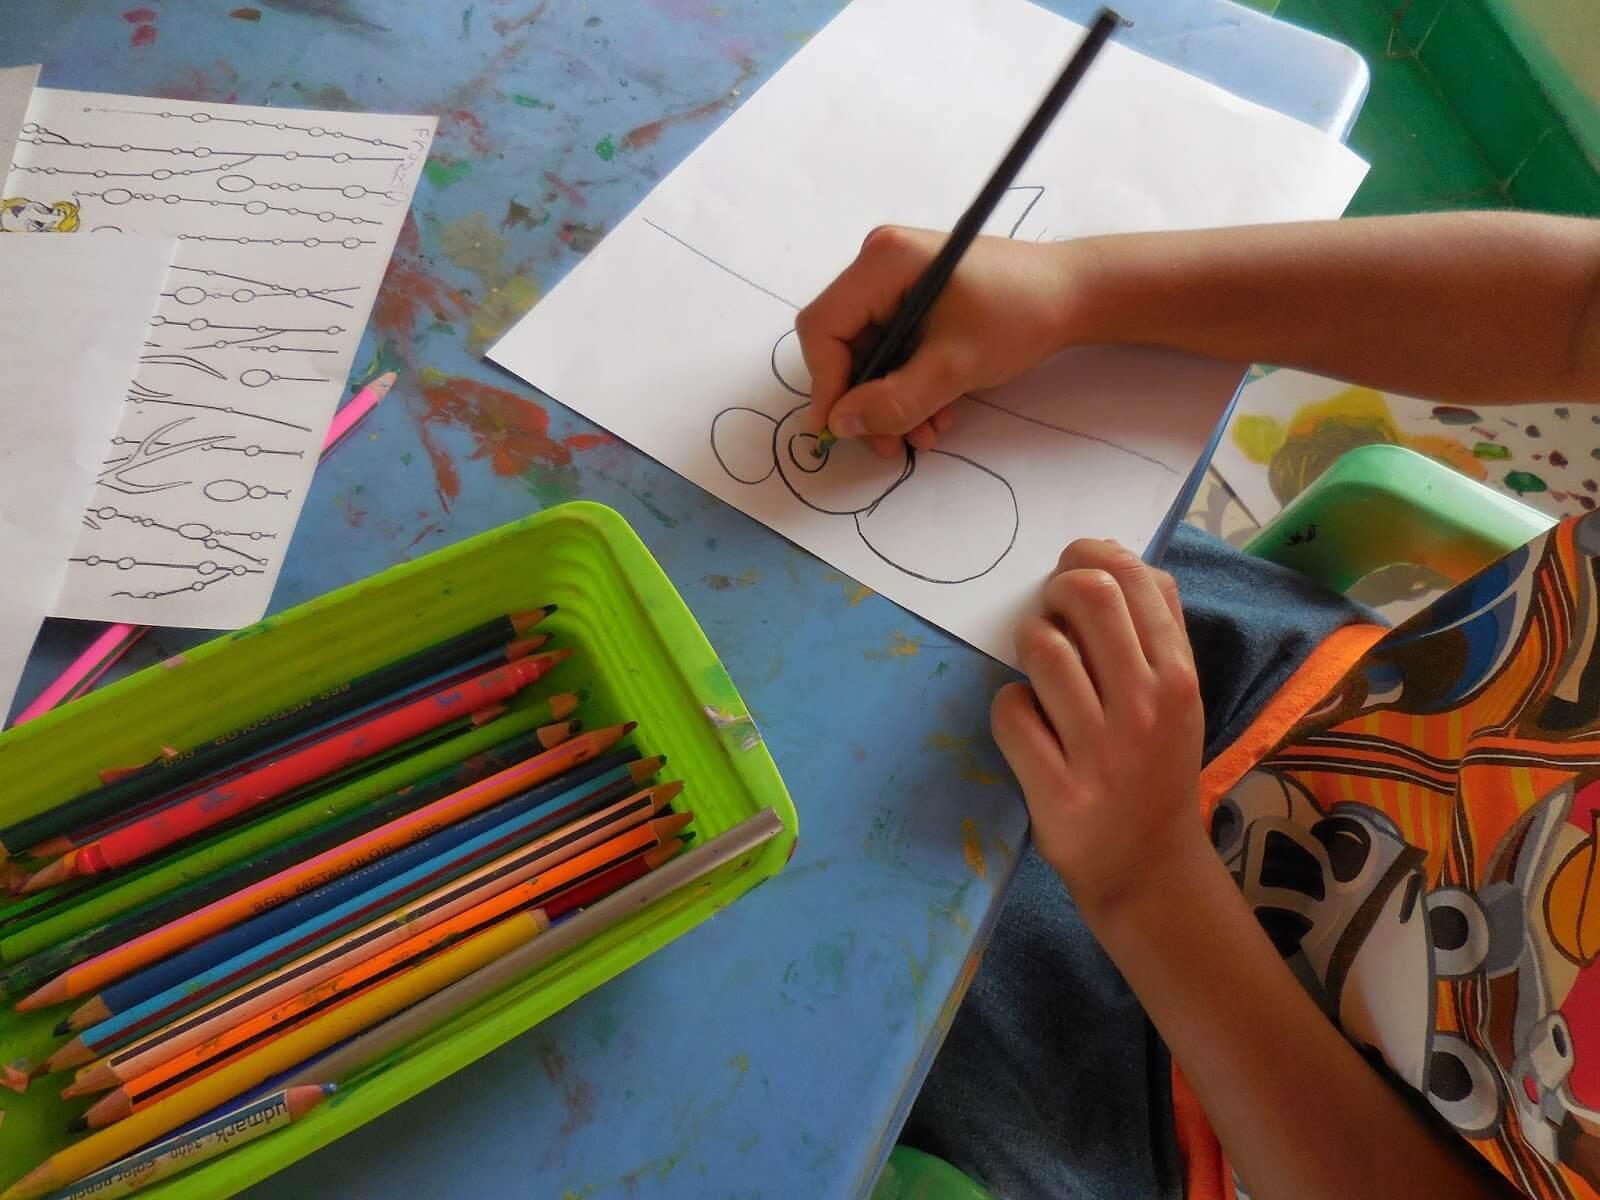 Las etapas del dibujo infantil manifiestan su grado de desarrollo.